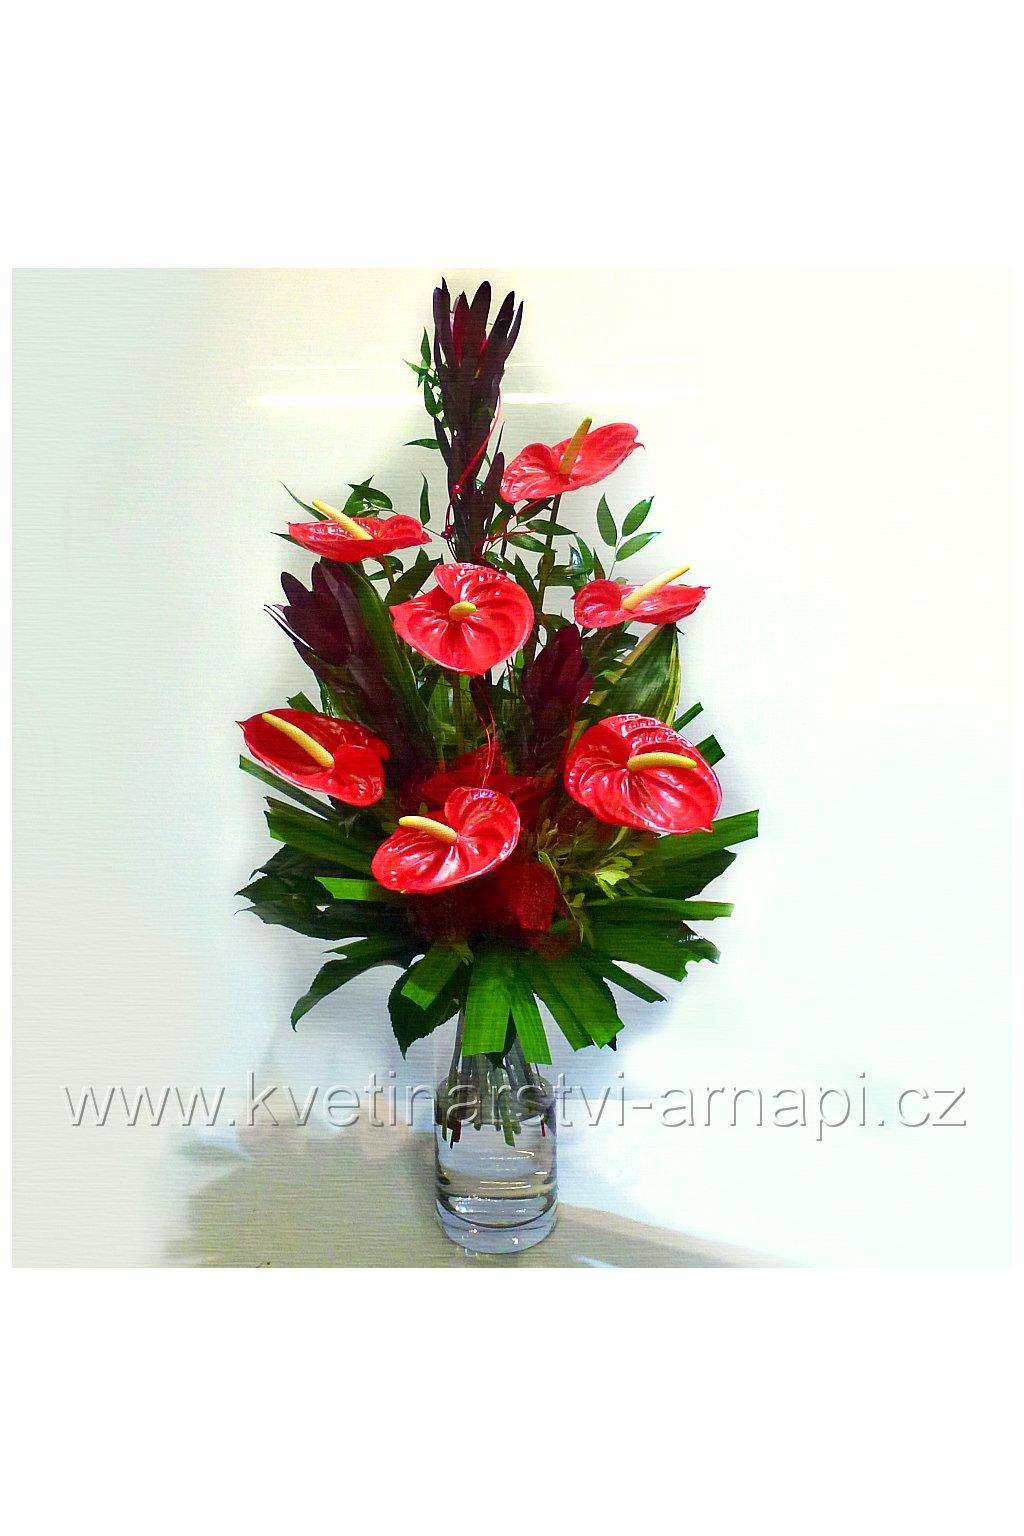 kytice anthuria kvetinarstvi arnapi